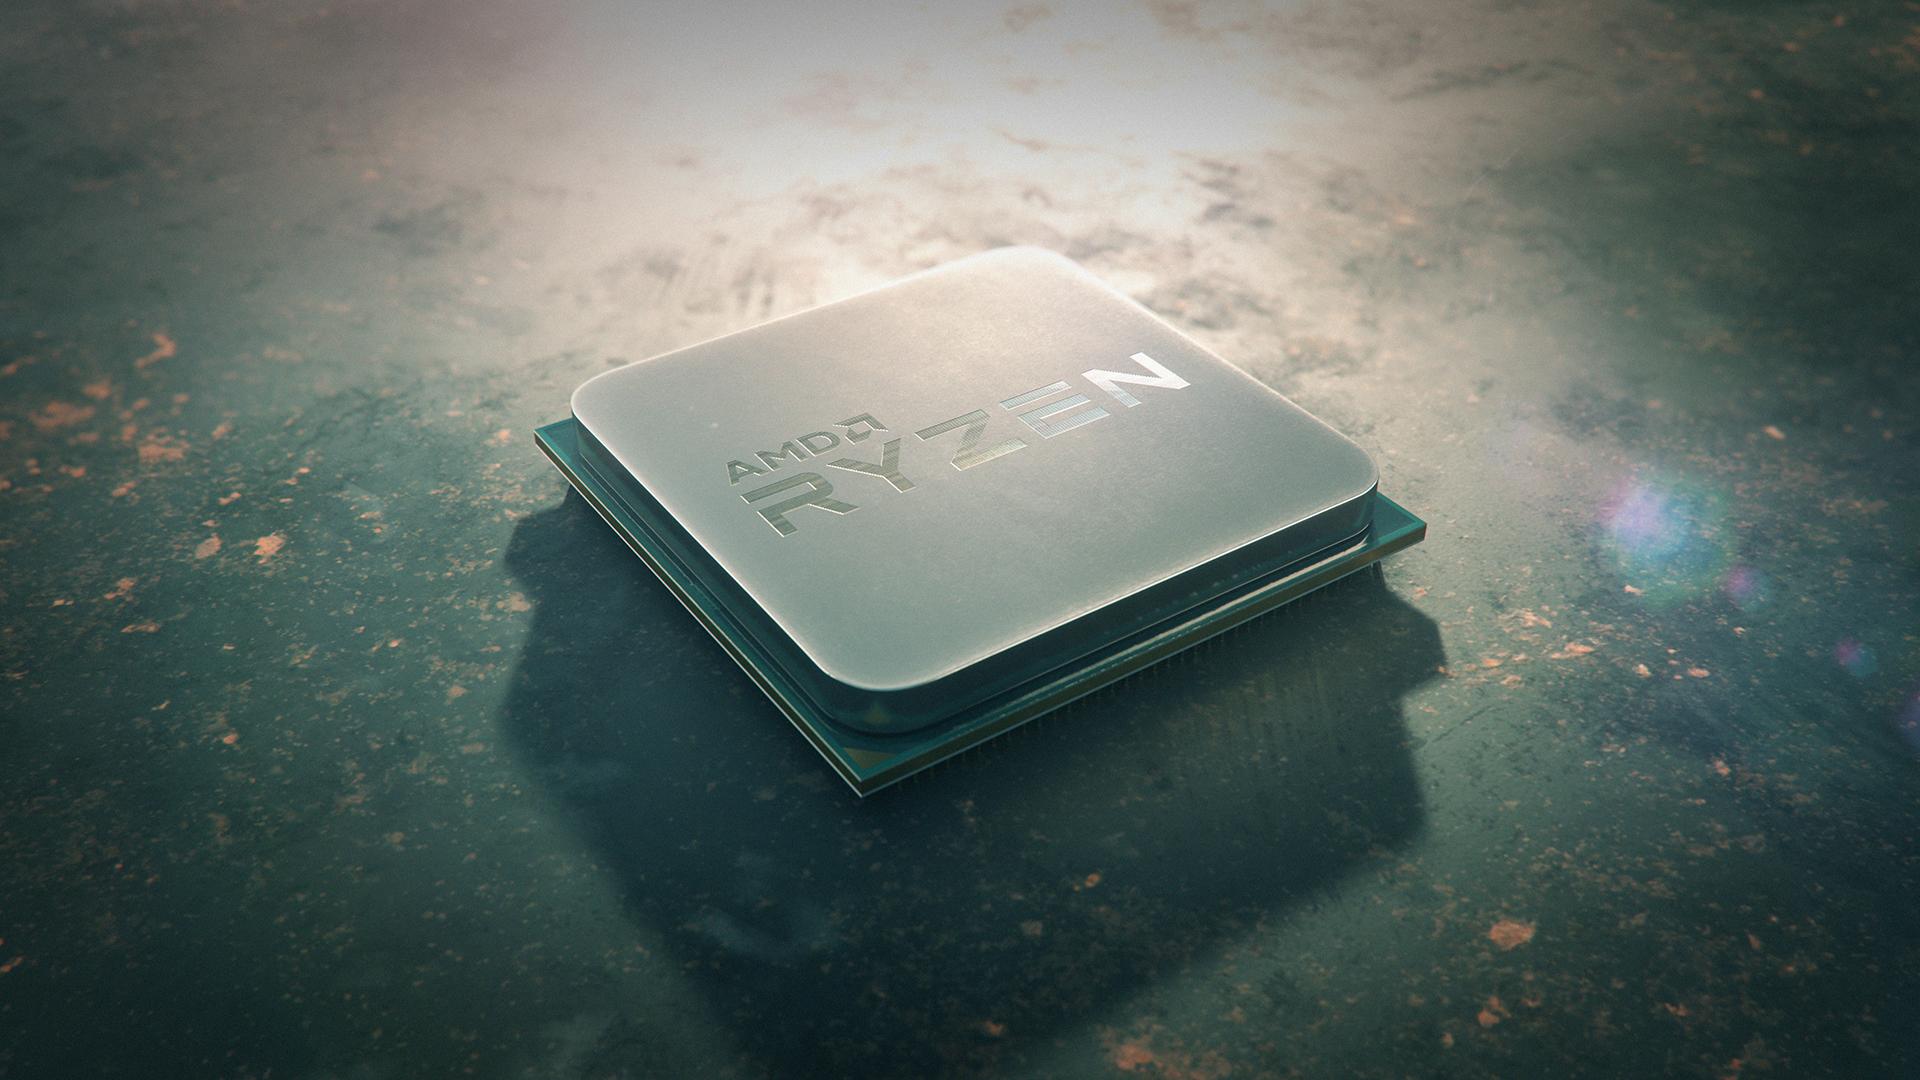 Amd Ryzen 5 2500x Benchmarks Reveal A Beefy Mid Range Processor